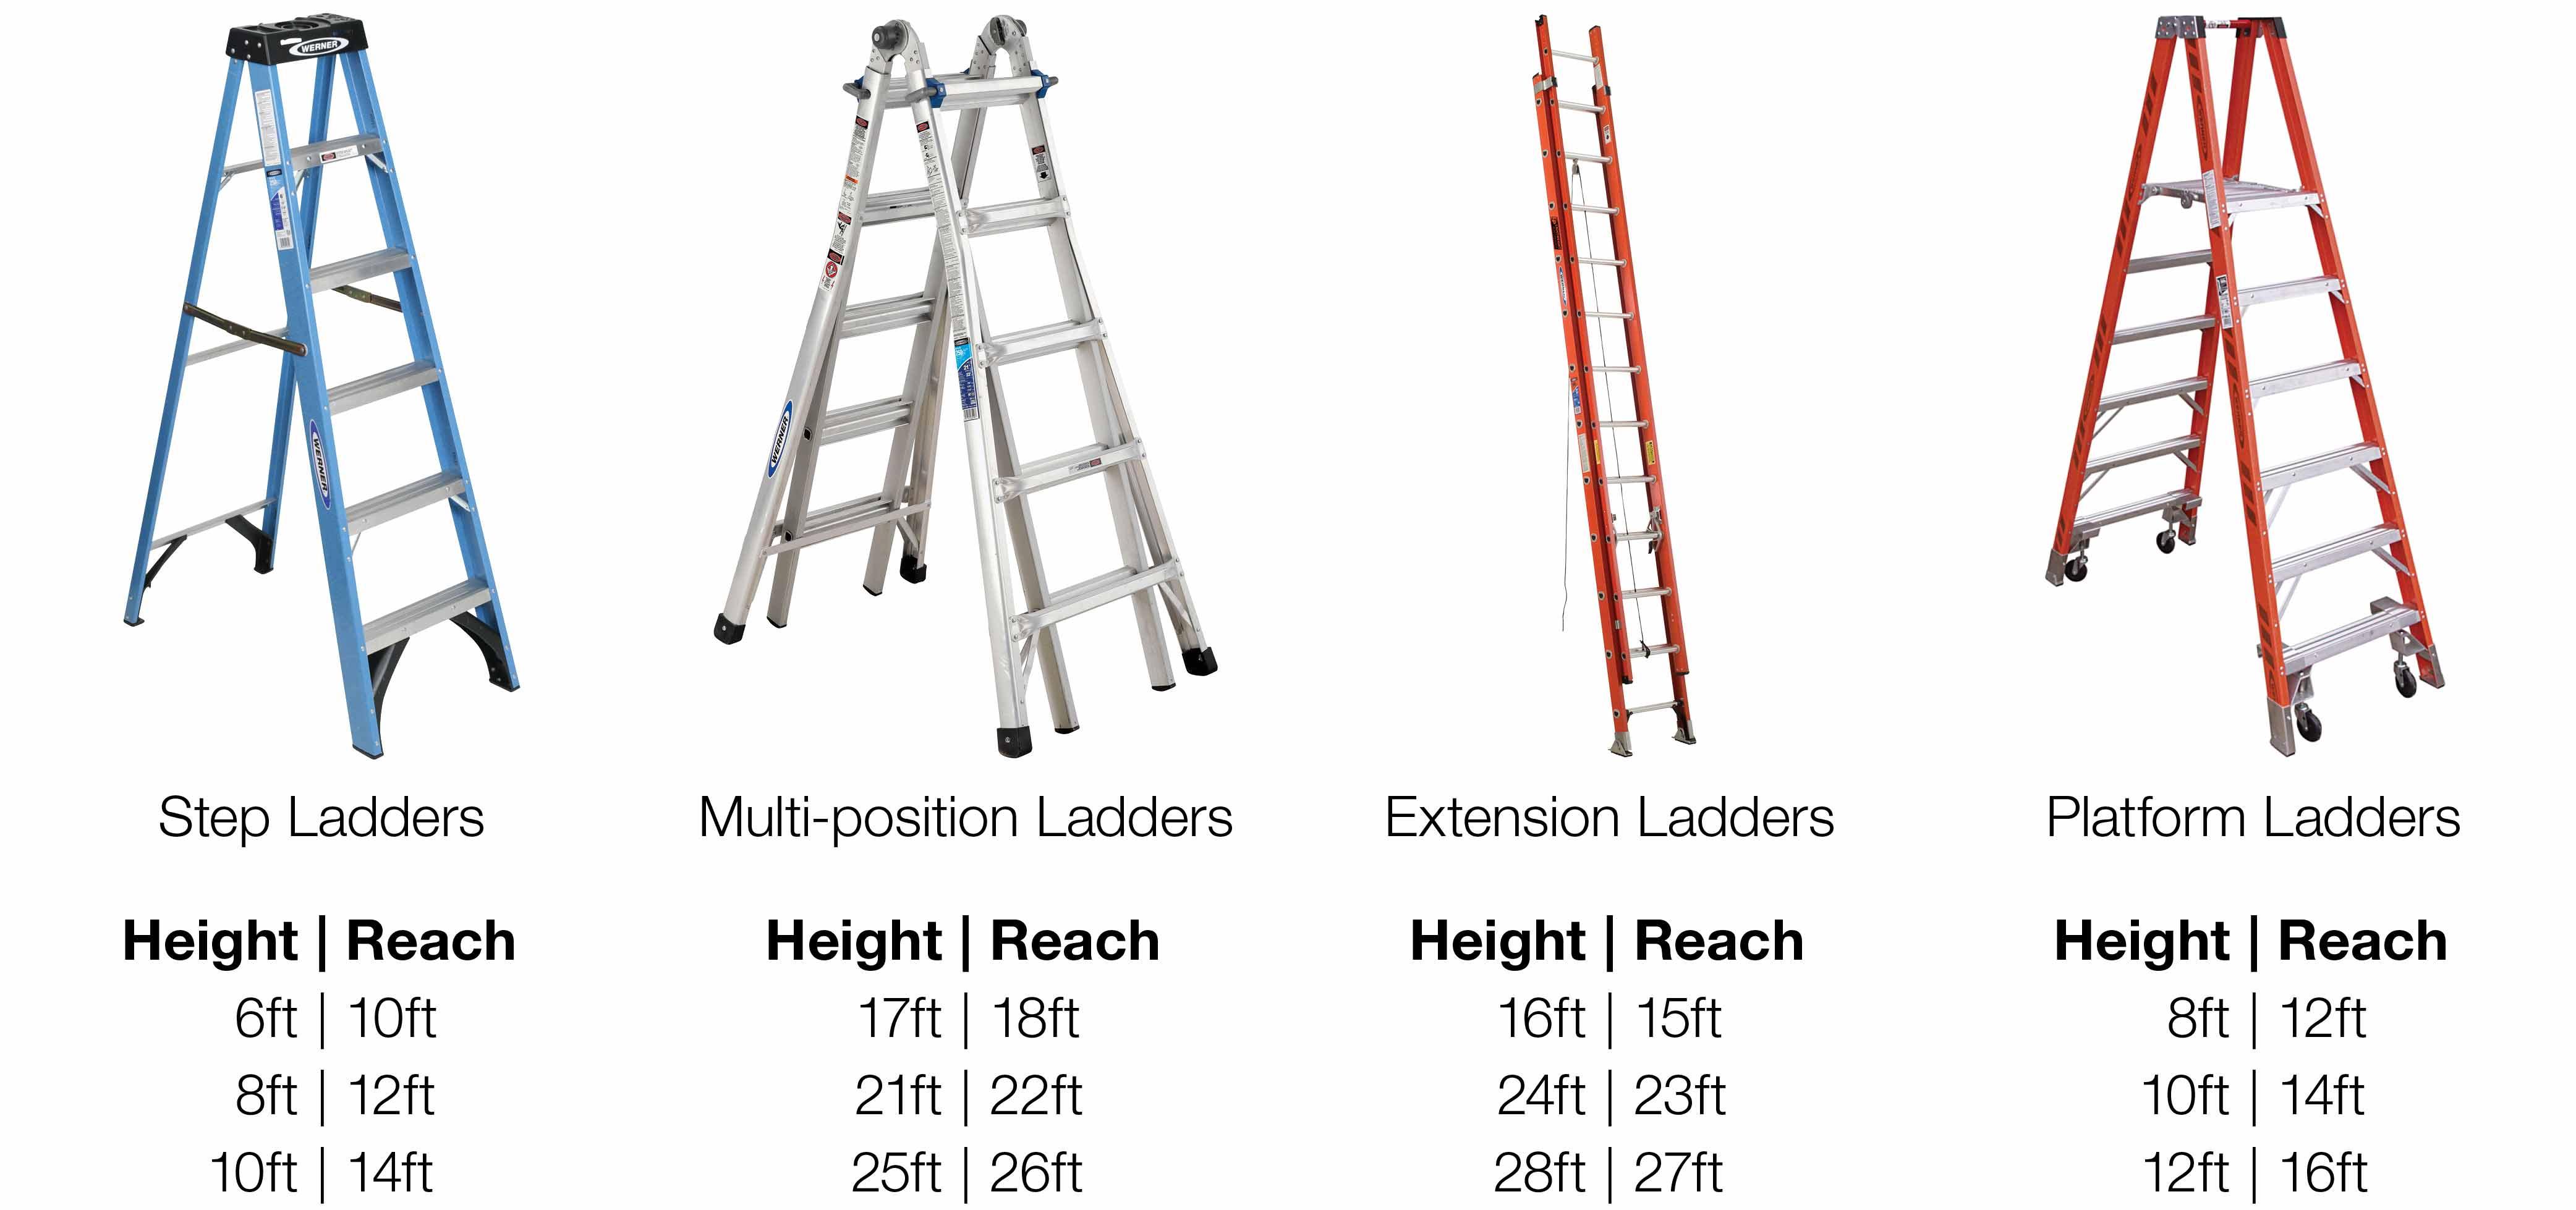 A chart showing ladder height vs. reach height